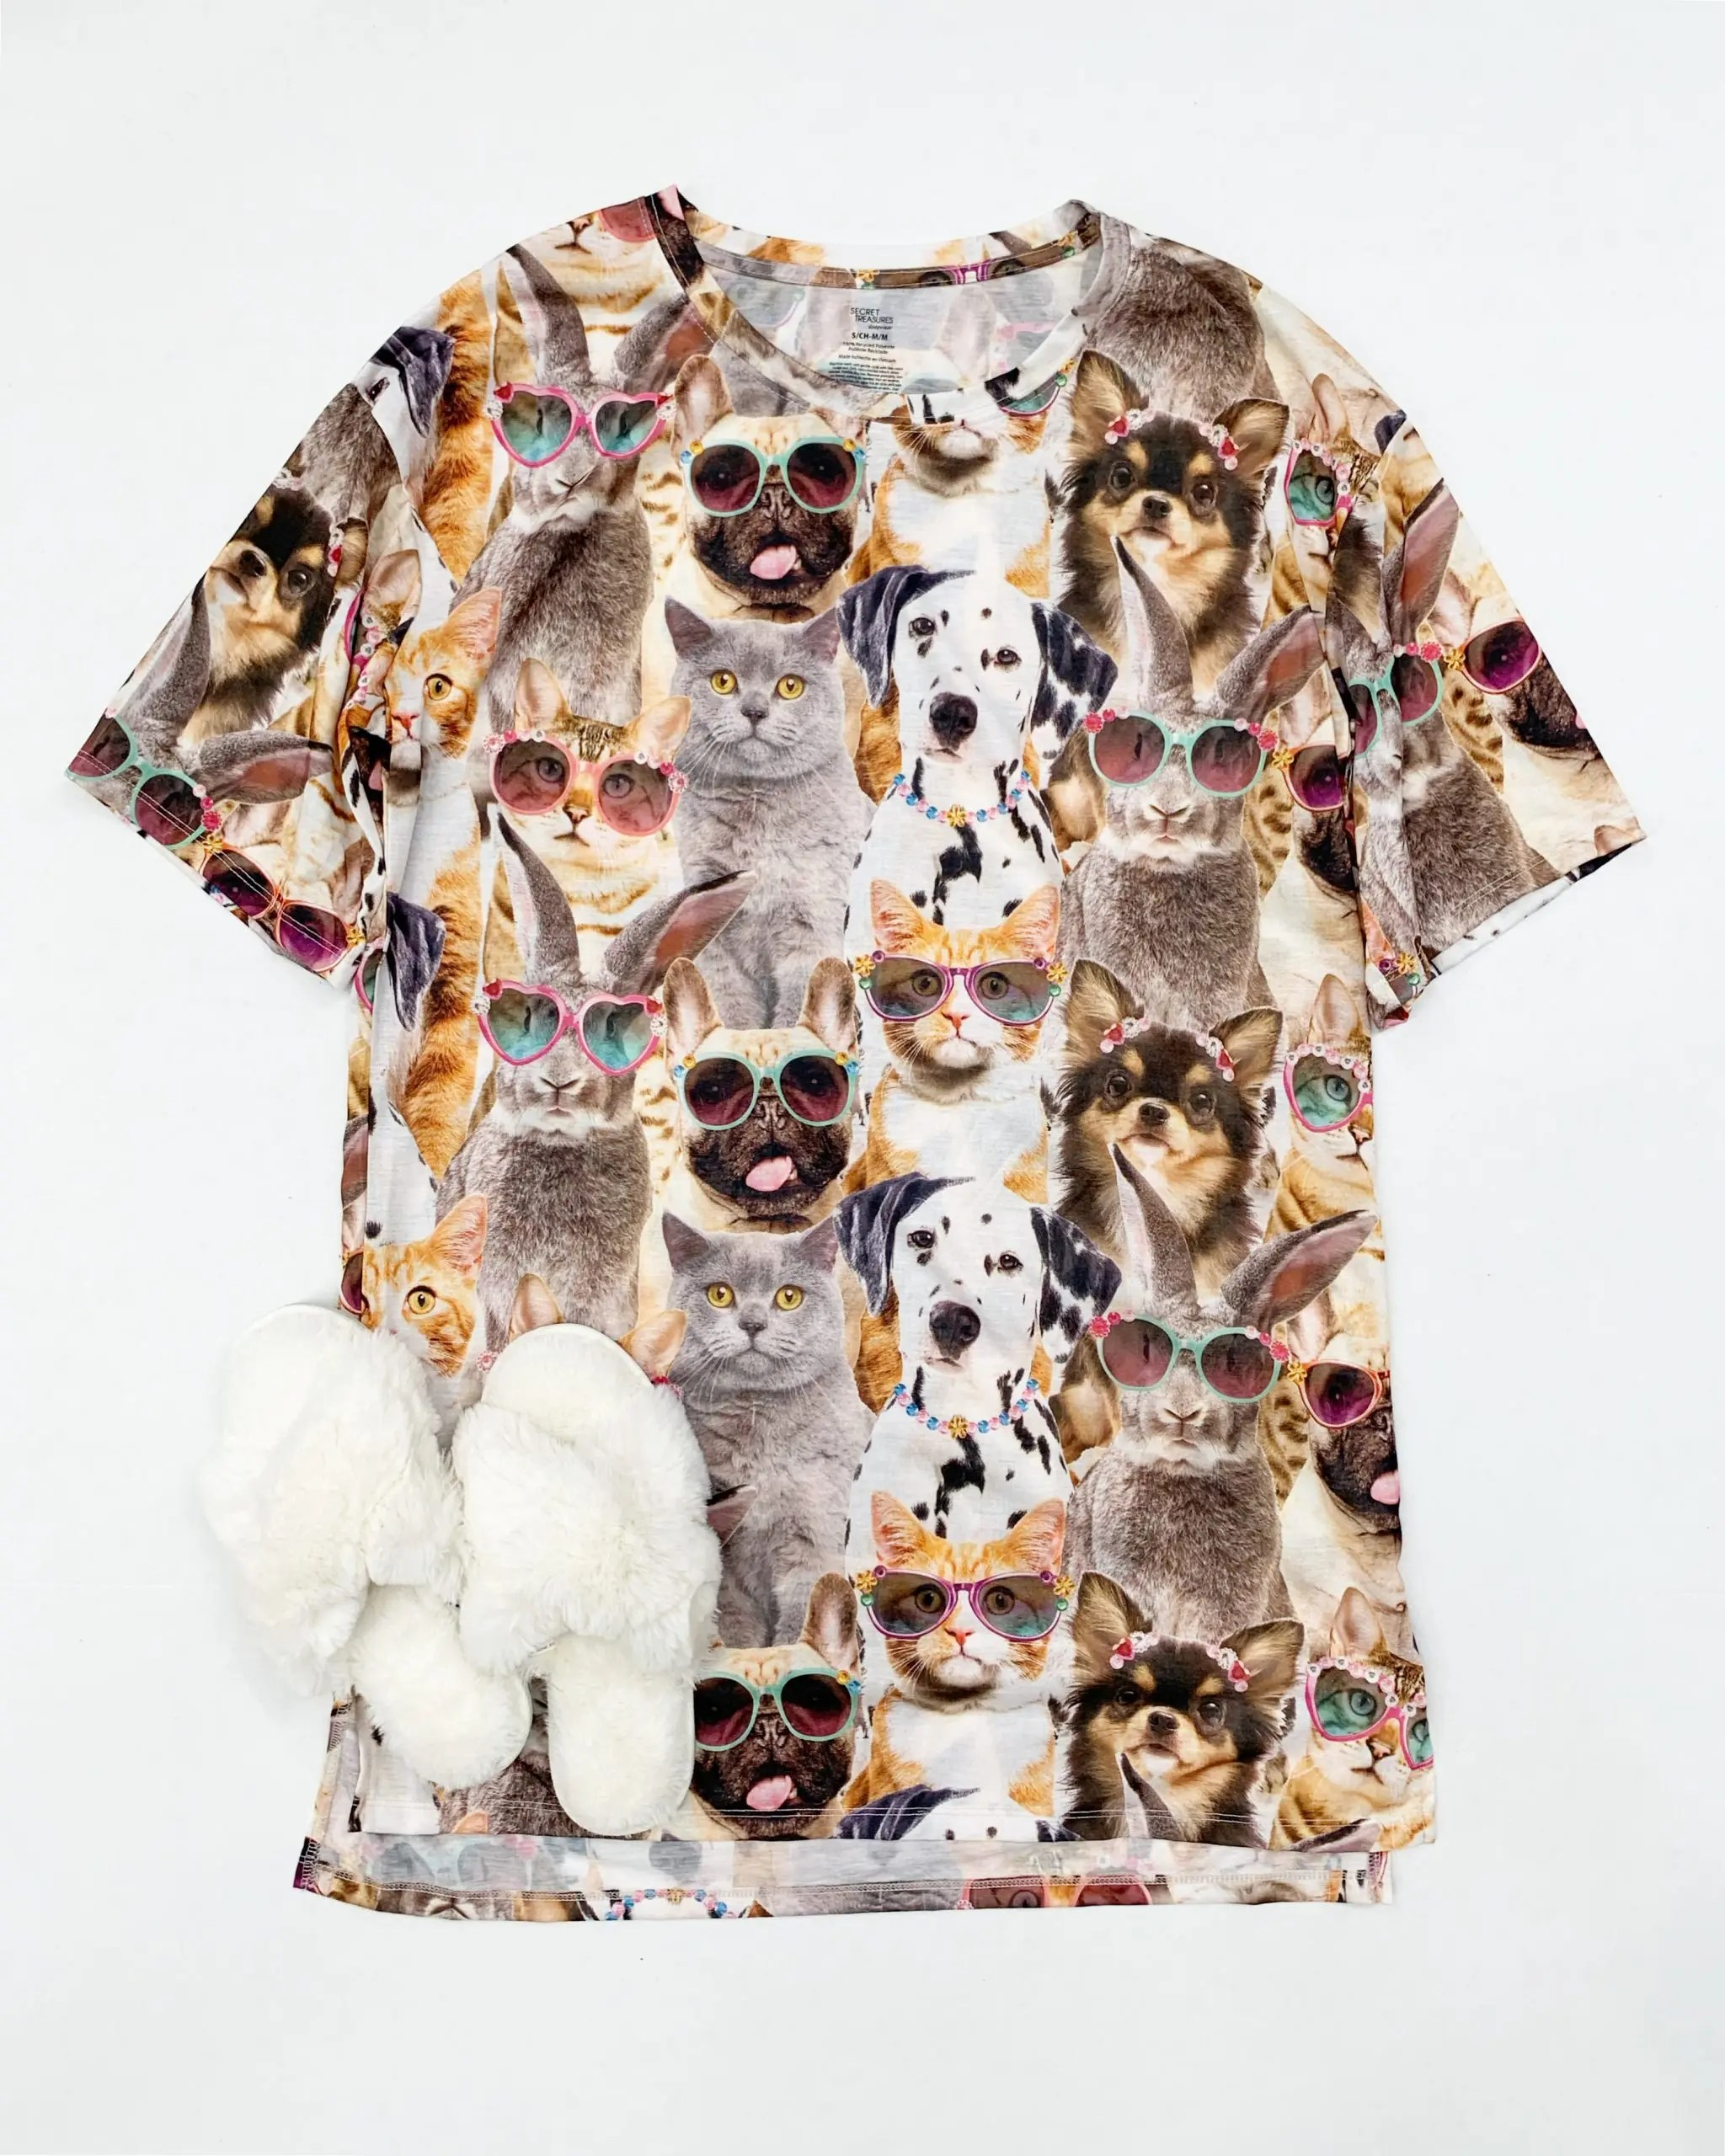 secret treasures animal sleep shirt and fuzzy slippers